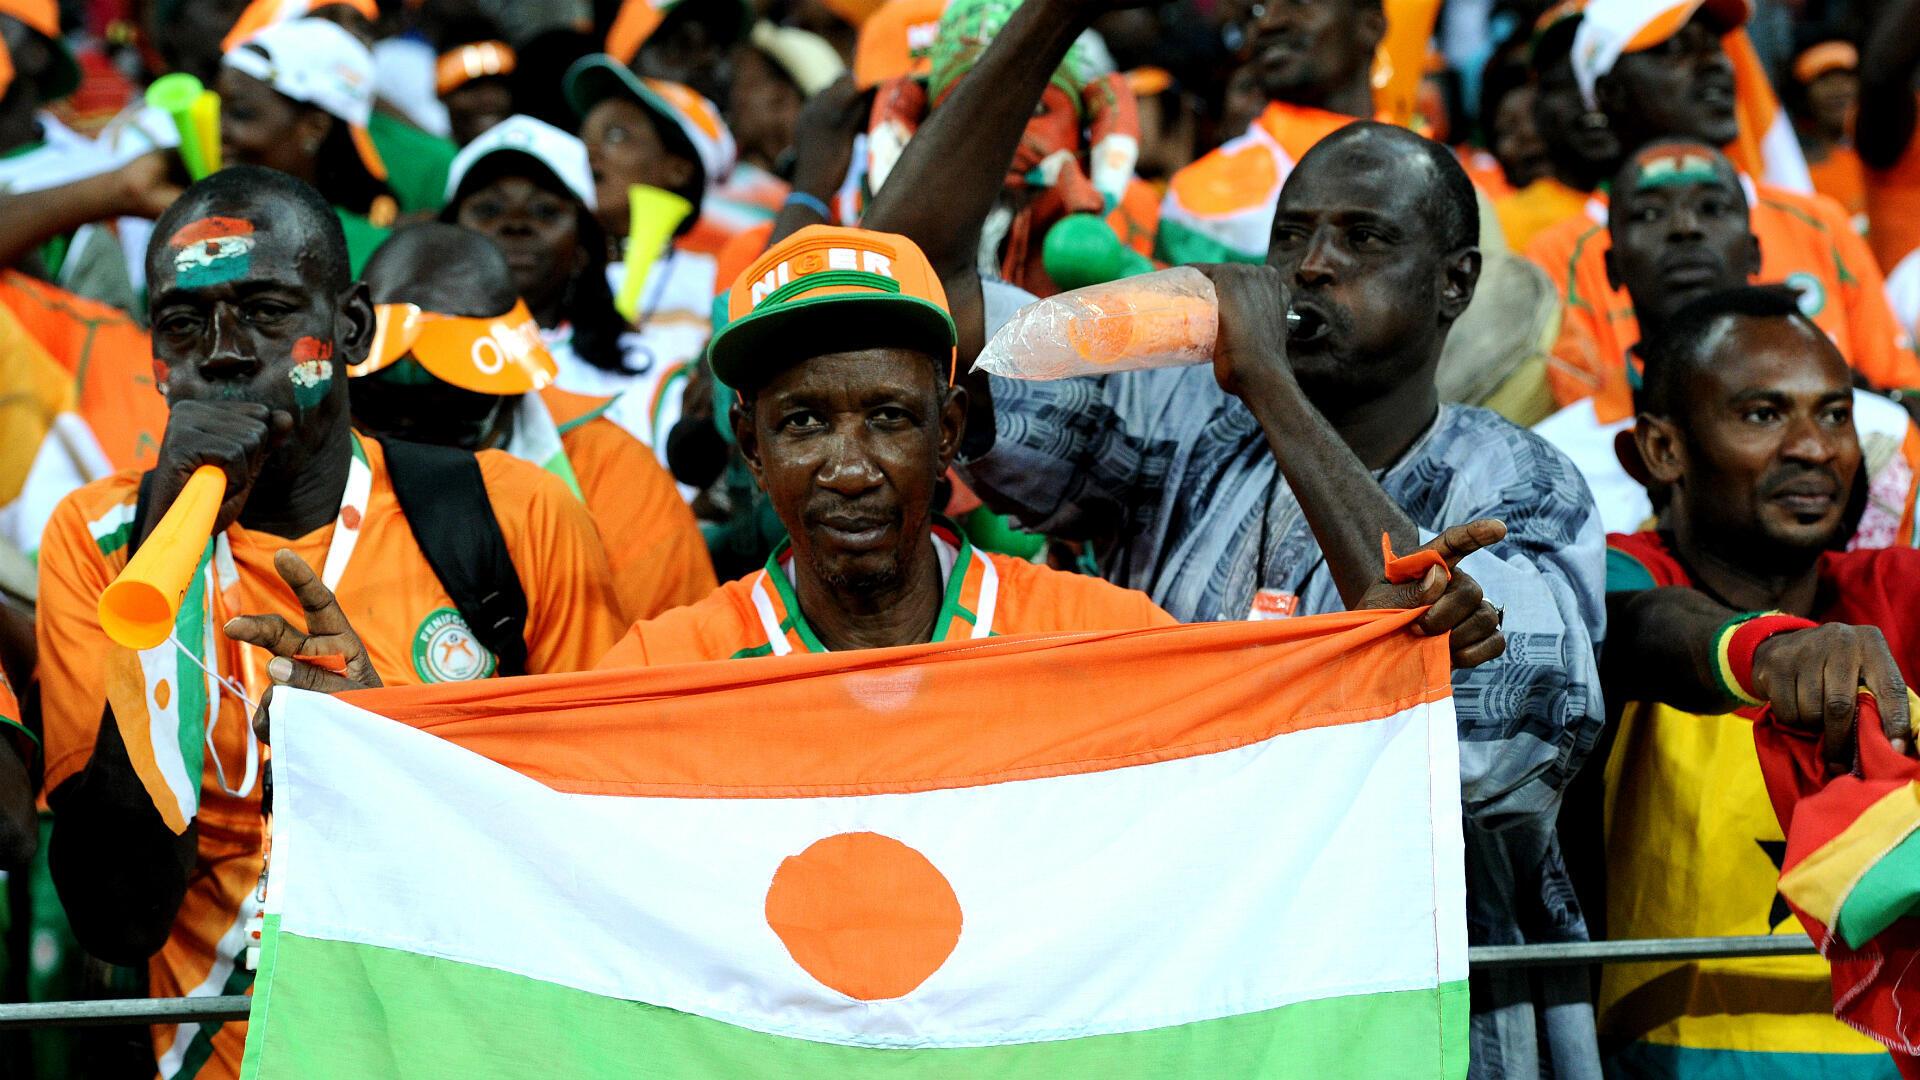 niger-fans_zf8ma0ter9vs1nvmt28ha4xh3